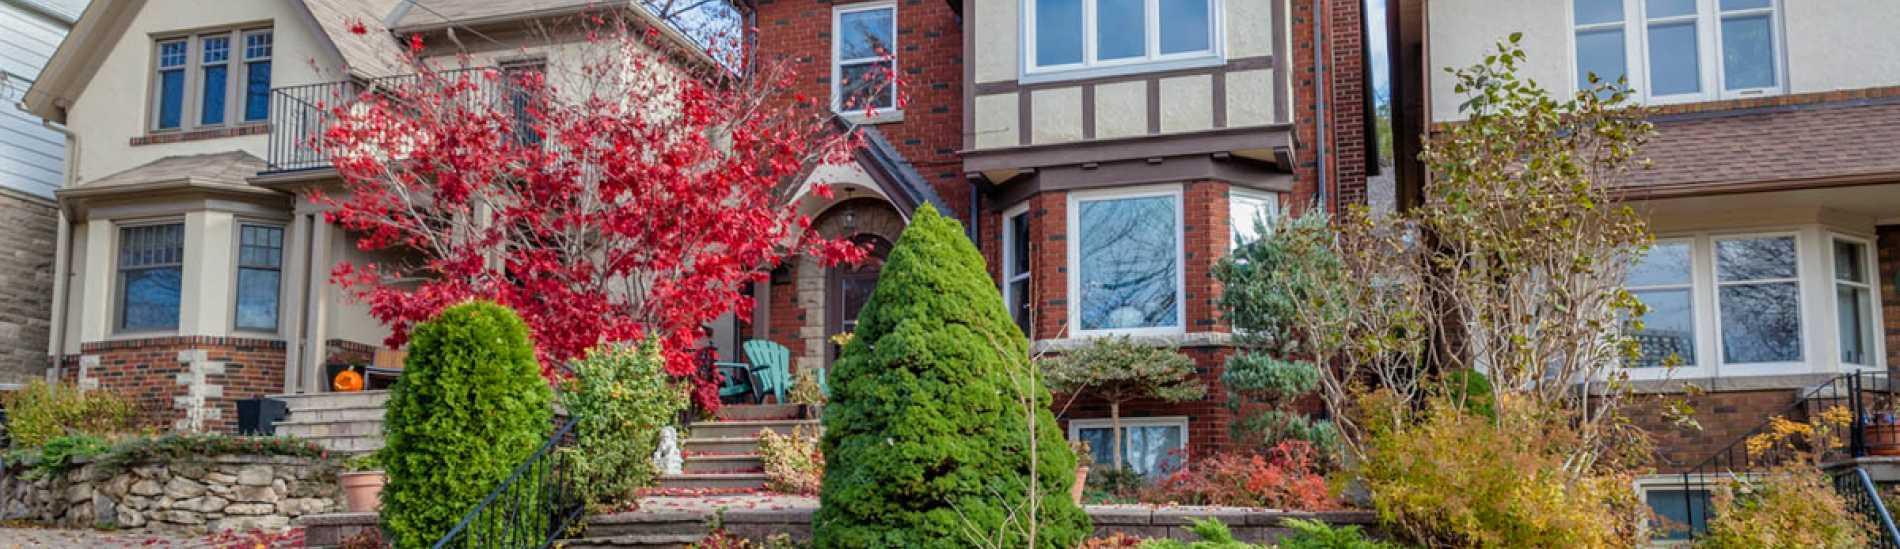 7 Finest Family Neighbourhoods in Toronto